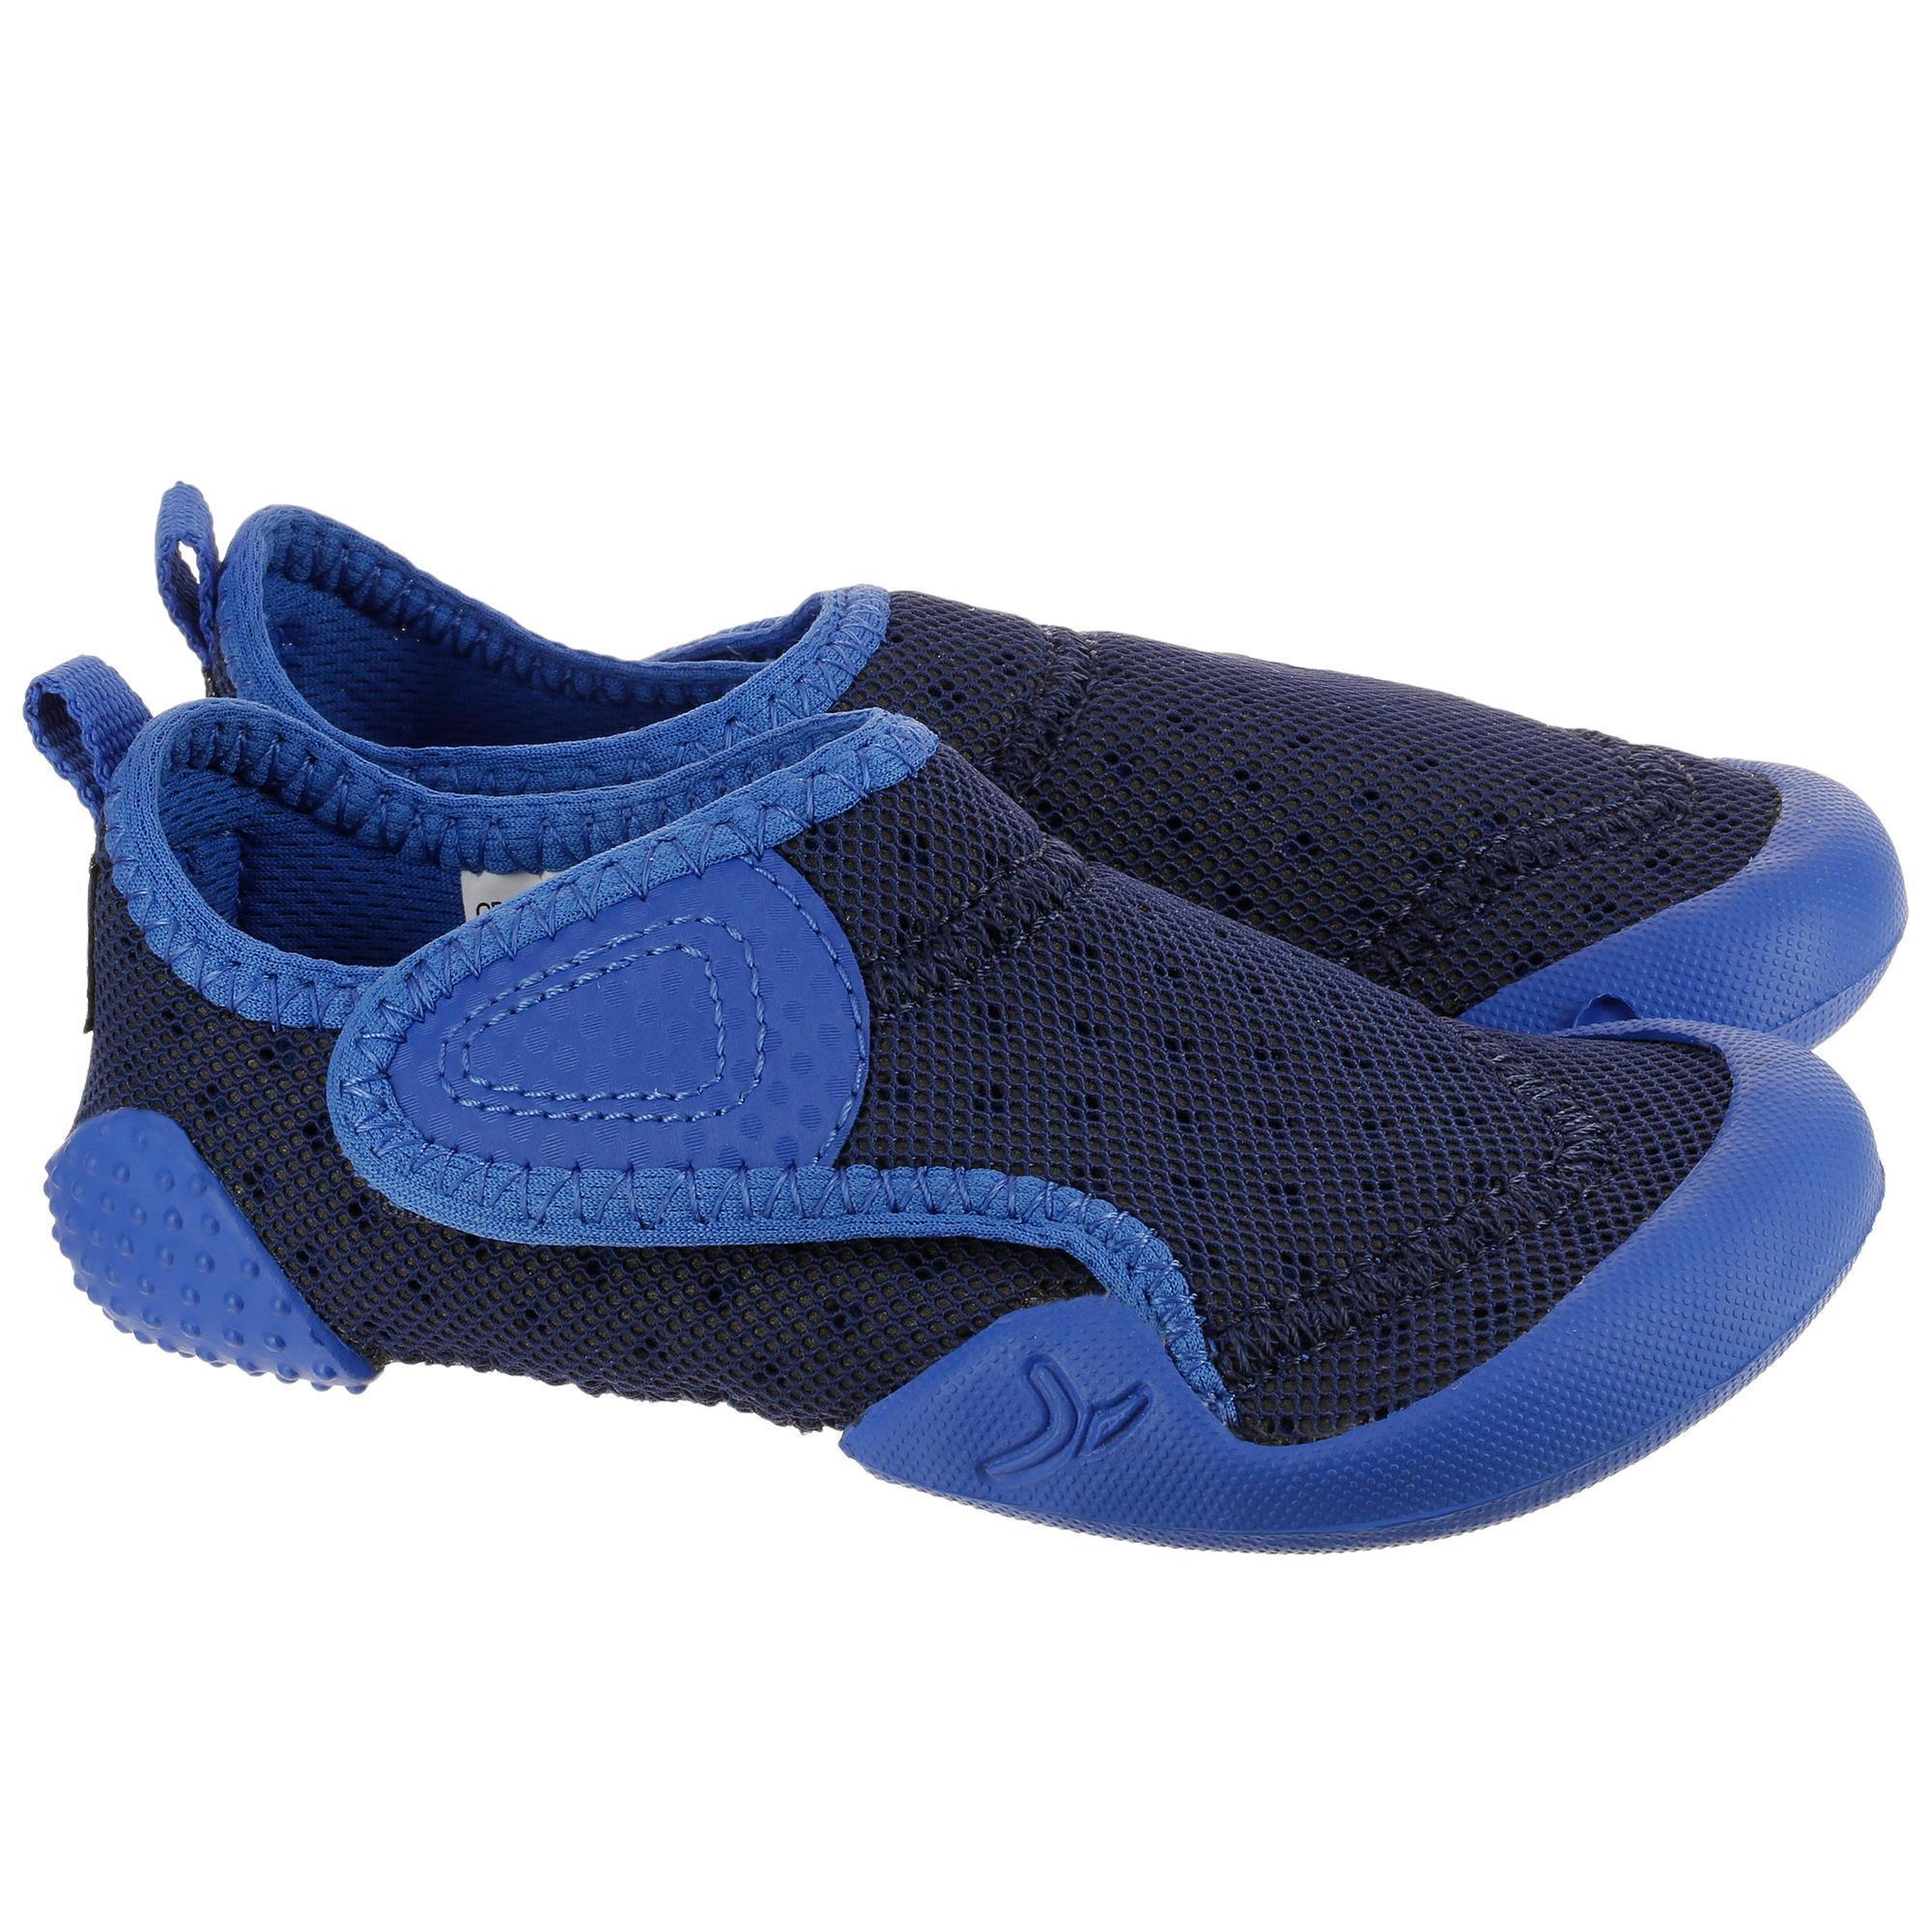 Babies' gym shoes - Domyos by Decathlon